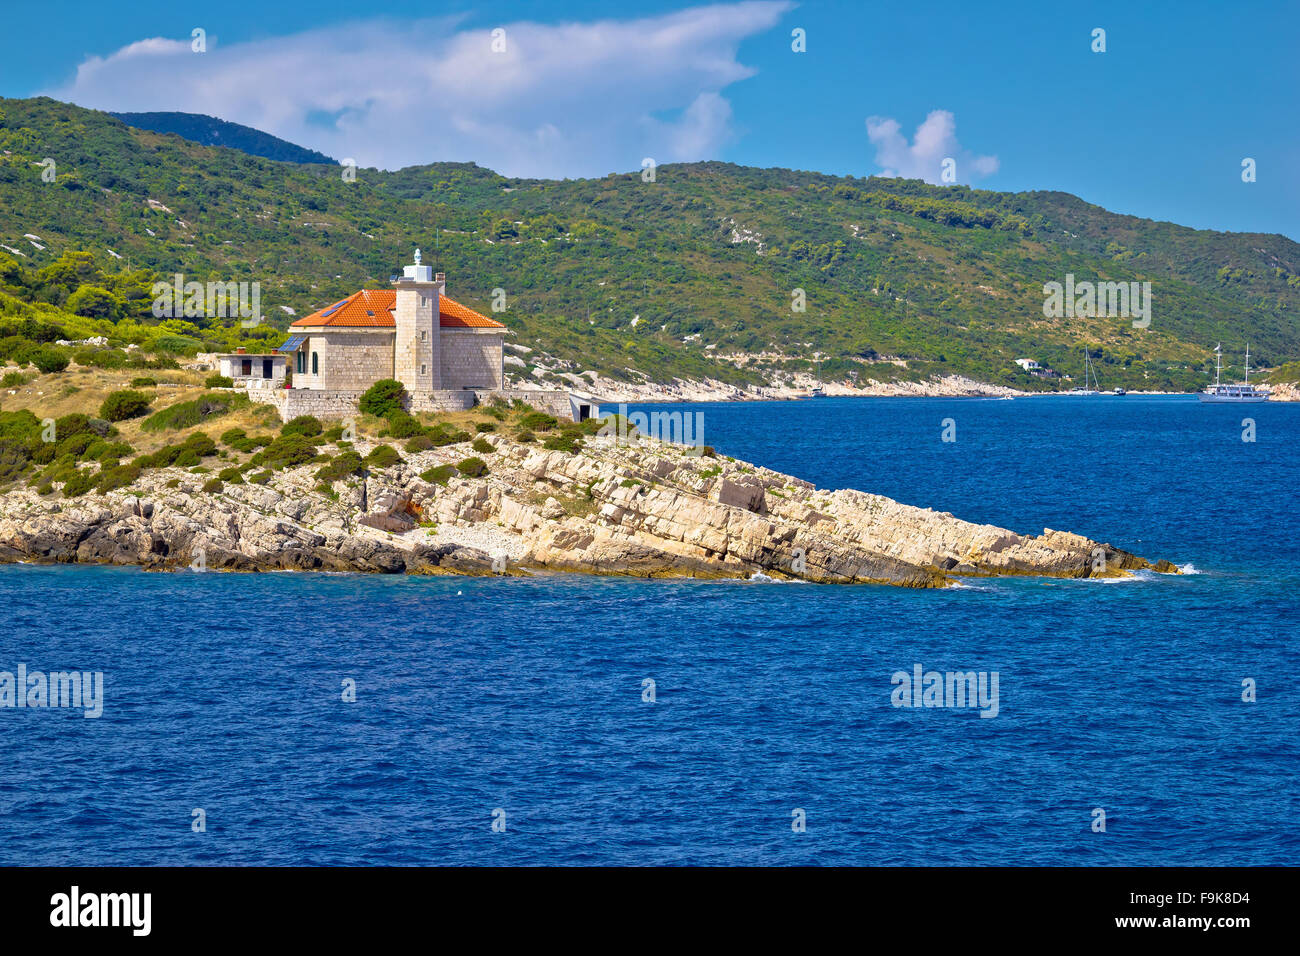 Isla de Vis lighthouse vista, Dalmacia, Croacia Foto de stock